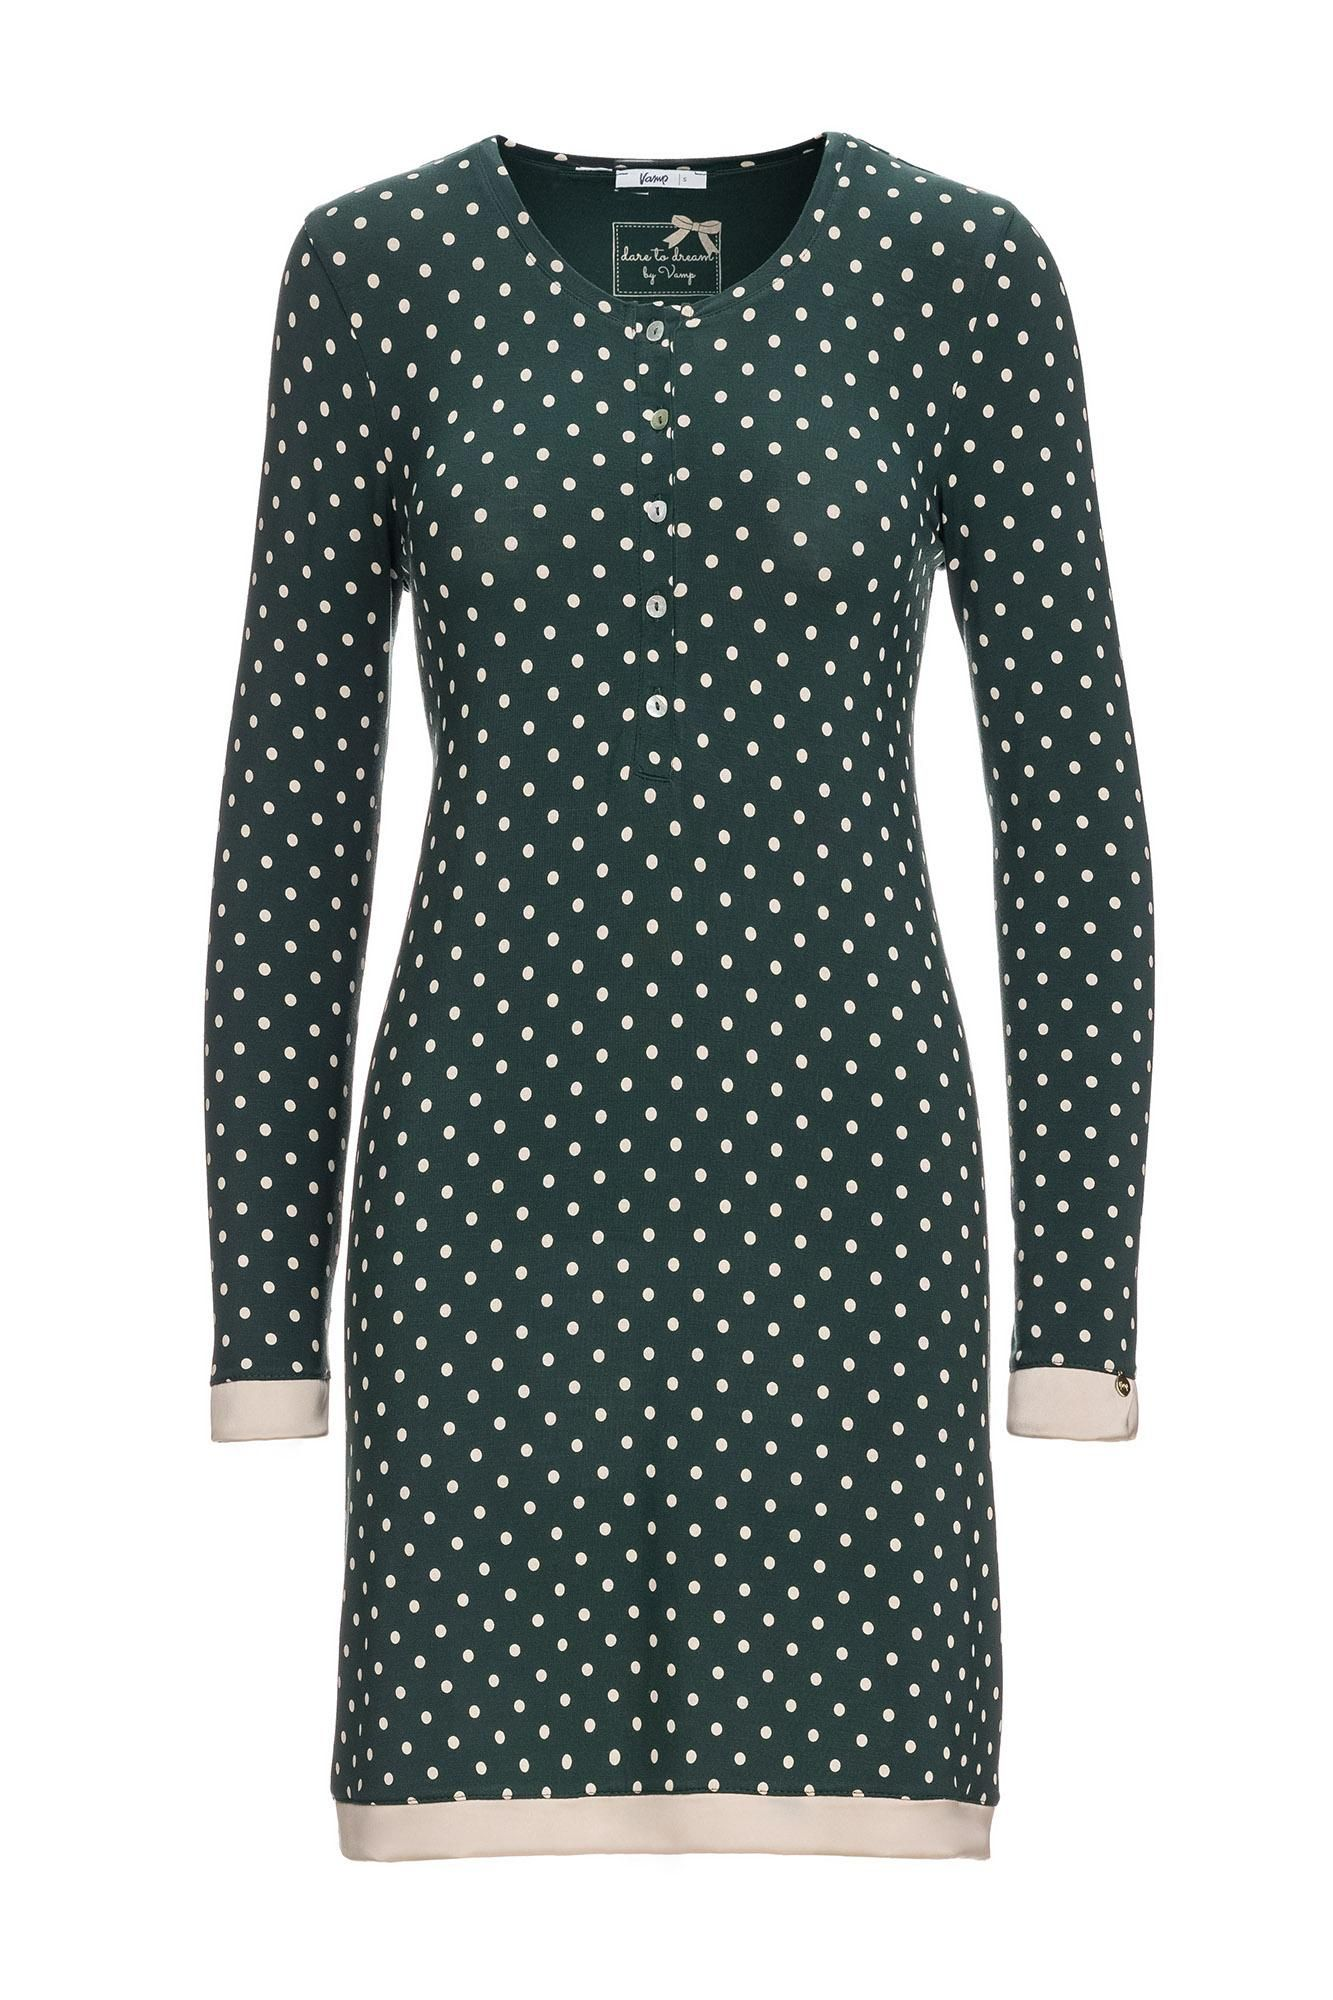 Women's Polka Dot Nursing Nightgown Plus Size